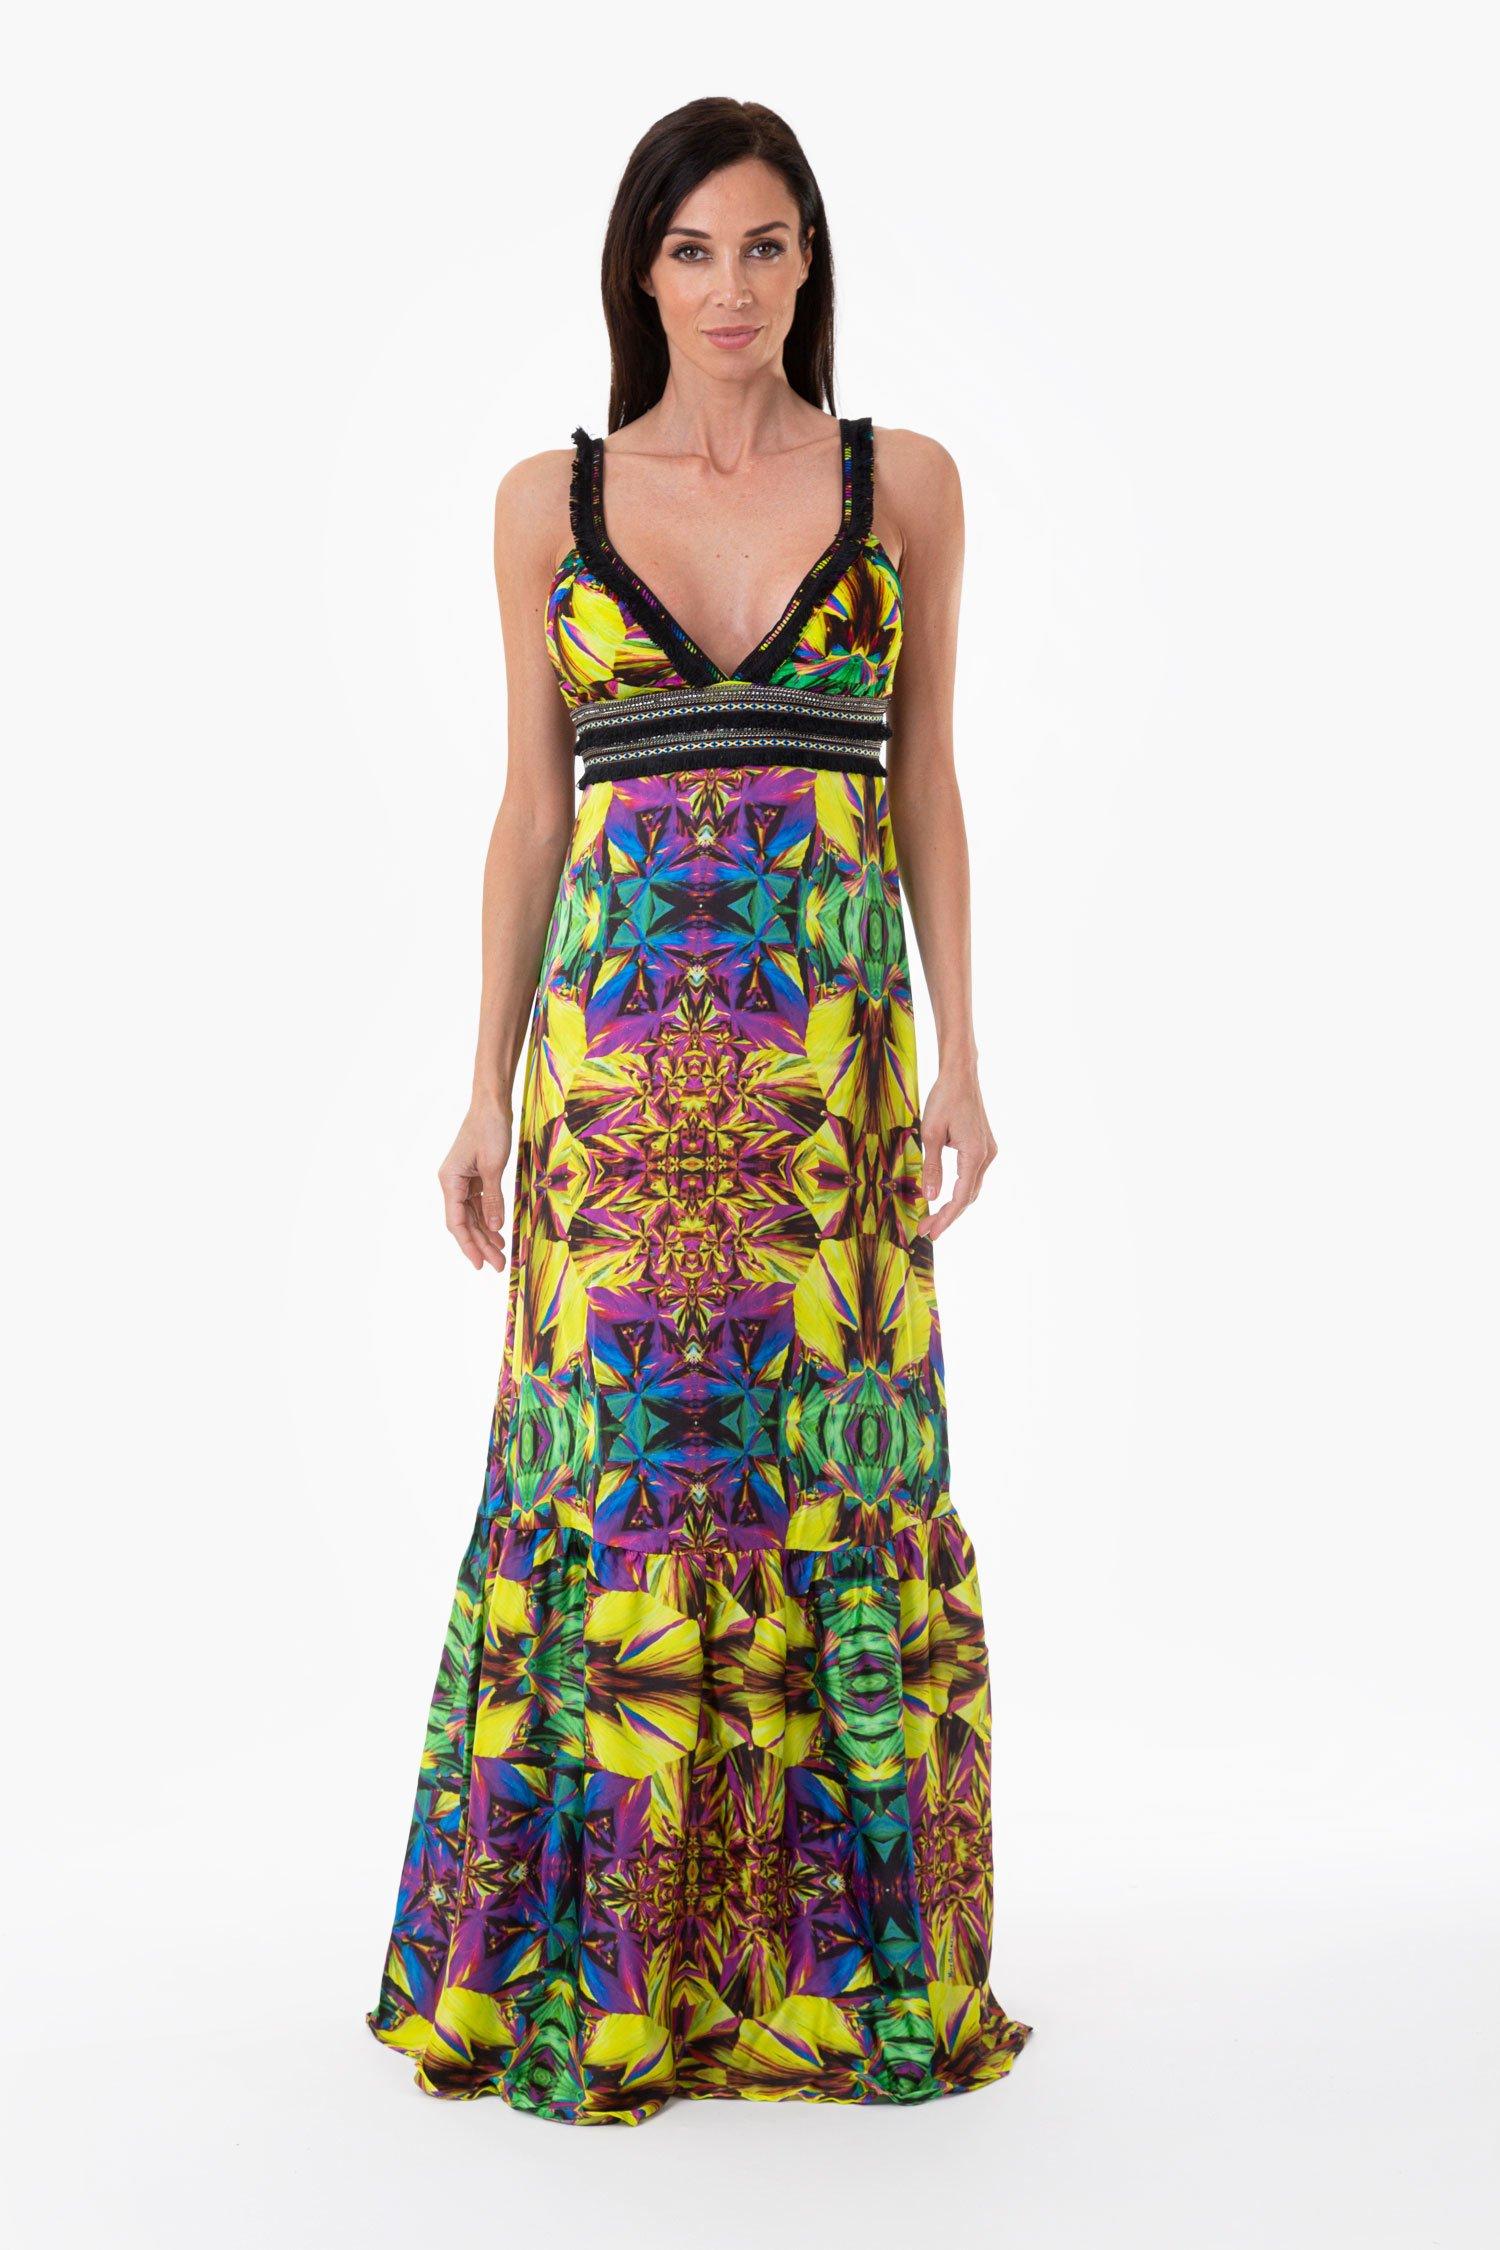 LONG DRESS CORSAGE - Yellow Kaleidoscope